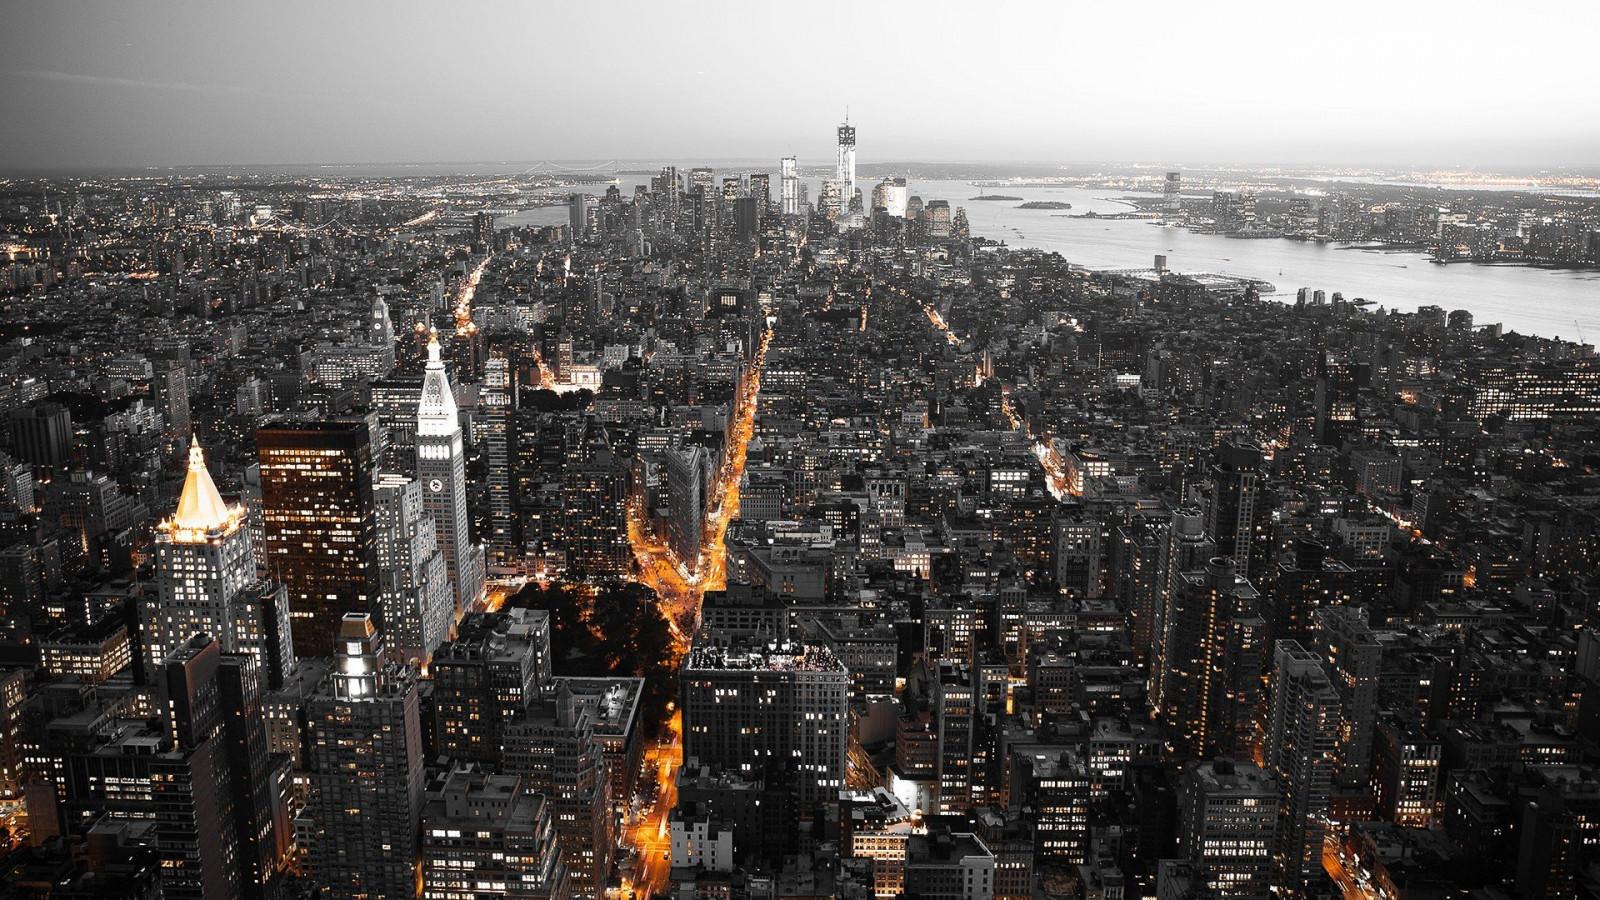 Wallpaper 1920x1080 Px New York City 1920x1080